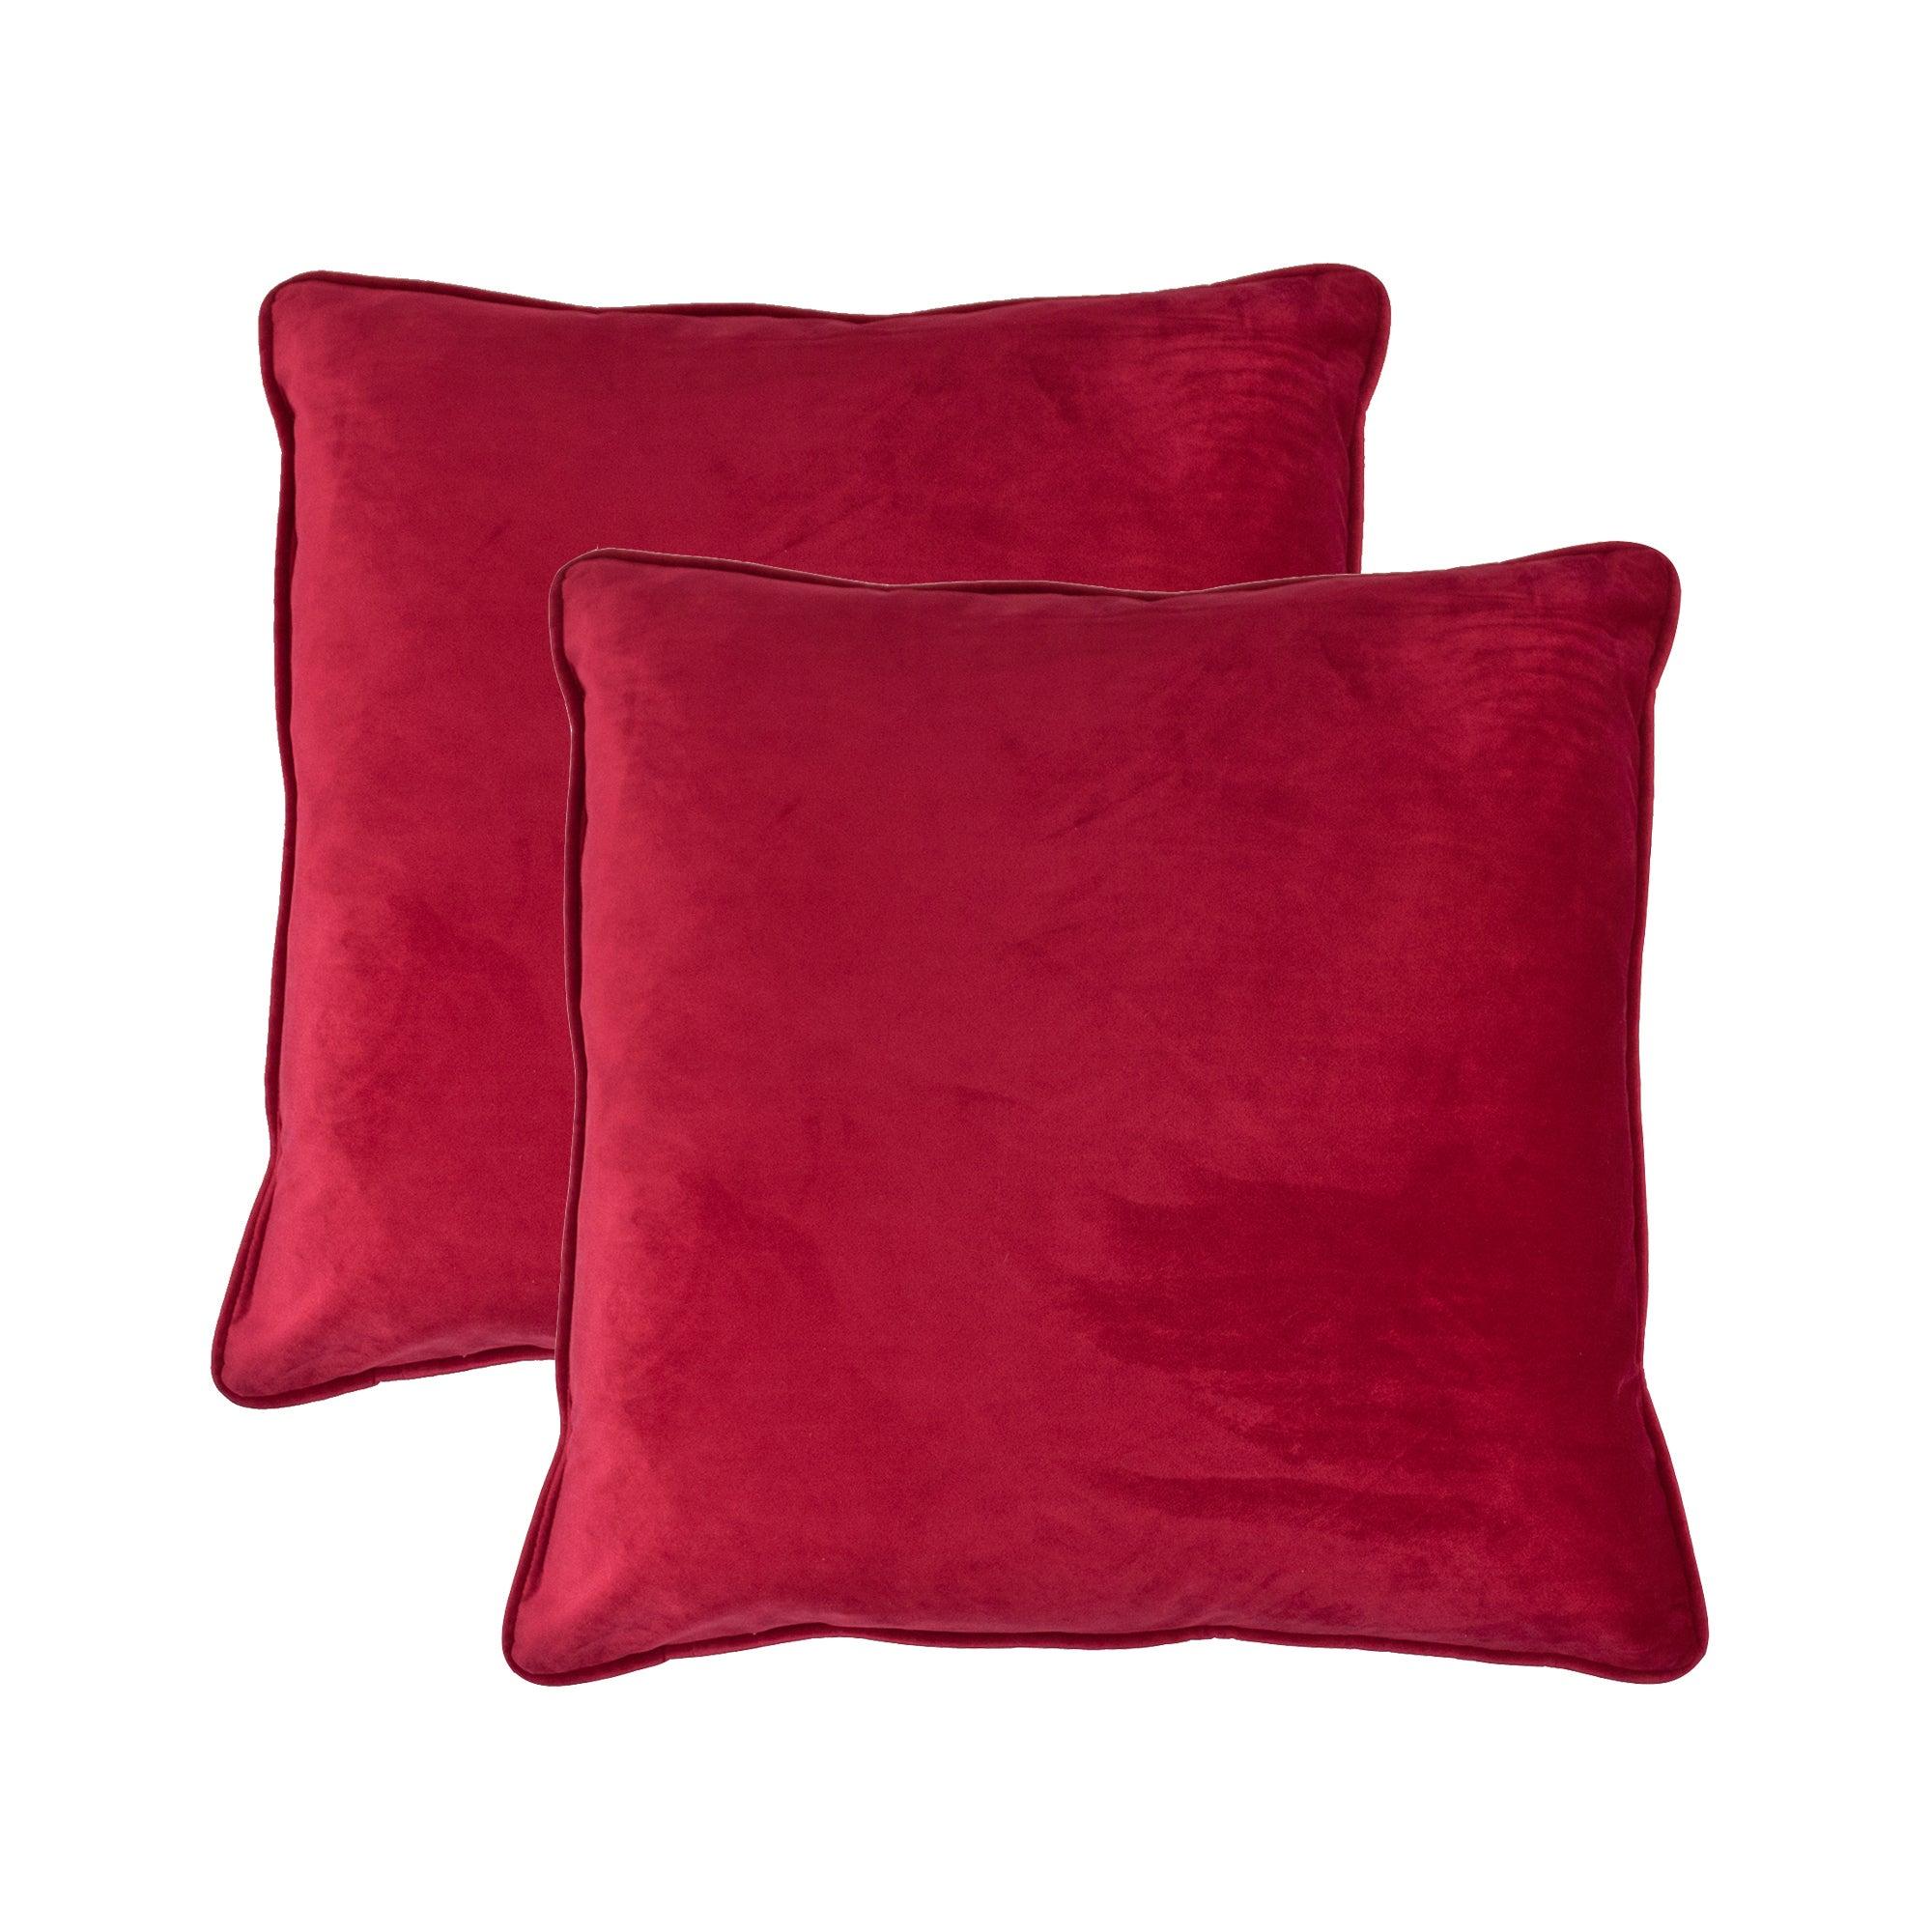 Sherry Kline Richmond Velvet 20 Inch Throw Pillow Set Of 2 Free Shipping Today 12363109